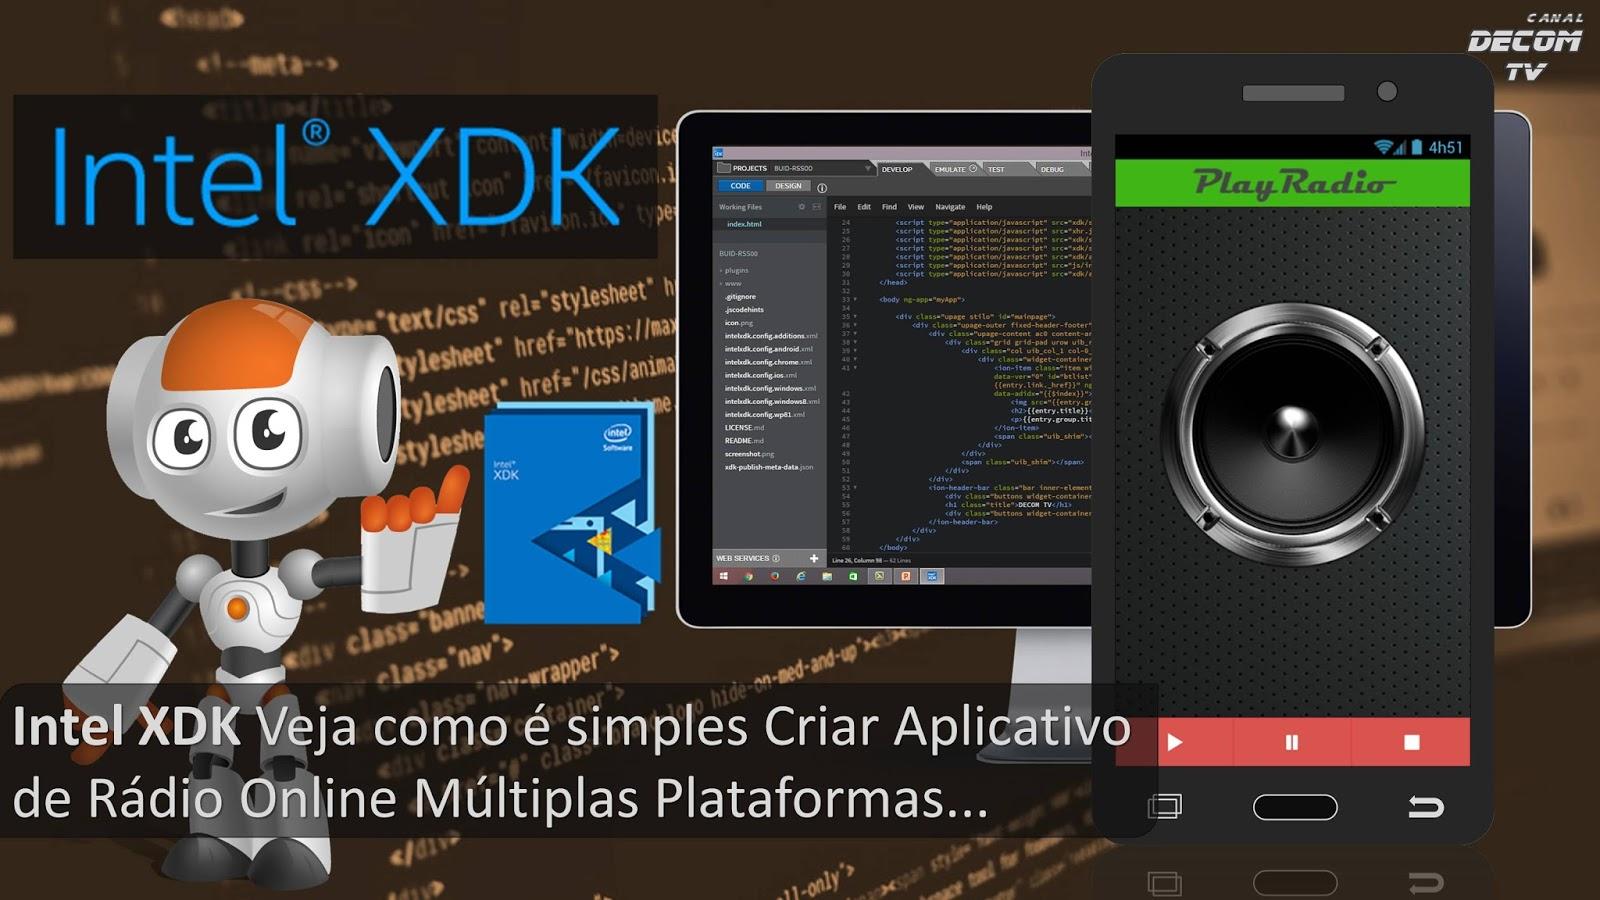 Intel xdk veja como simples criar aplicativo de rdio online intel xdk veja como simples criar aplicativo de rdio online mltiplas plataformas stopboris Gallery